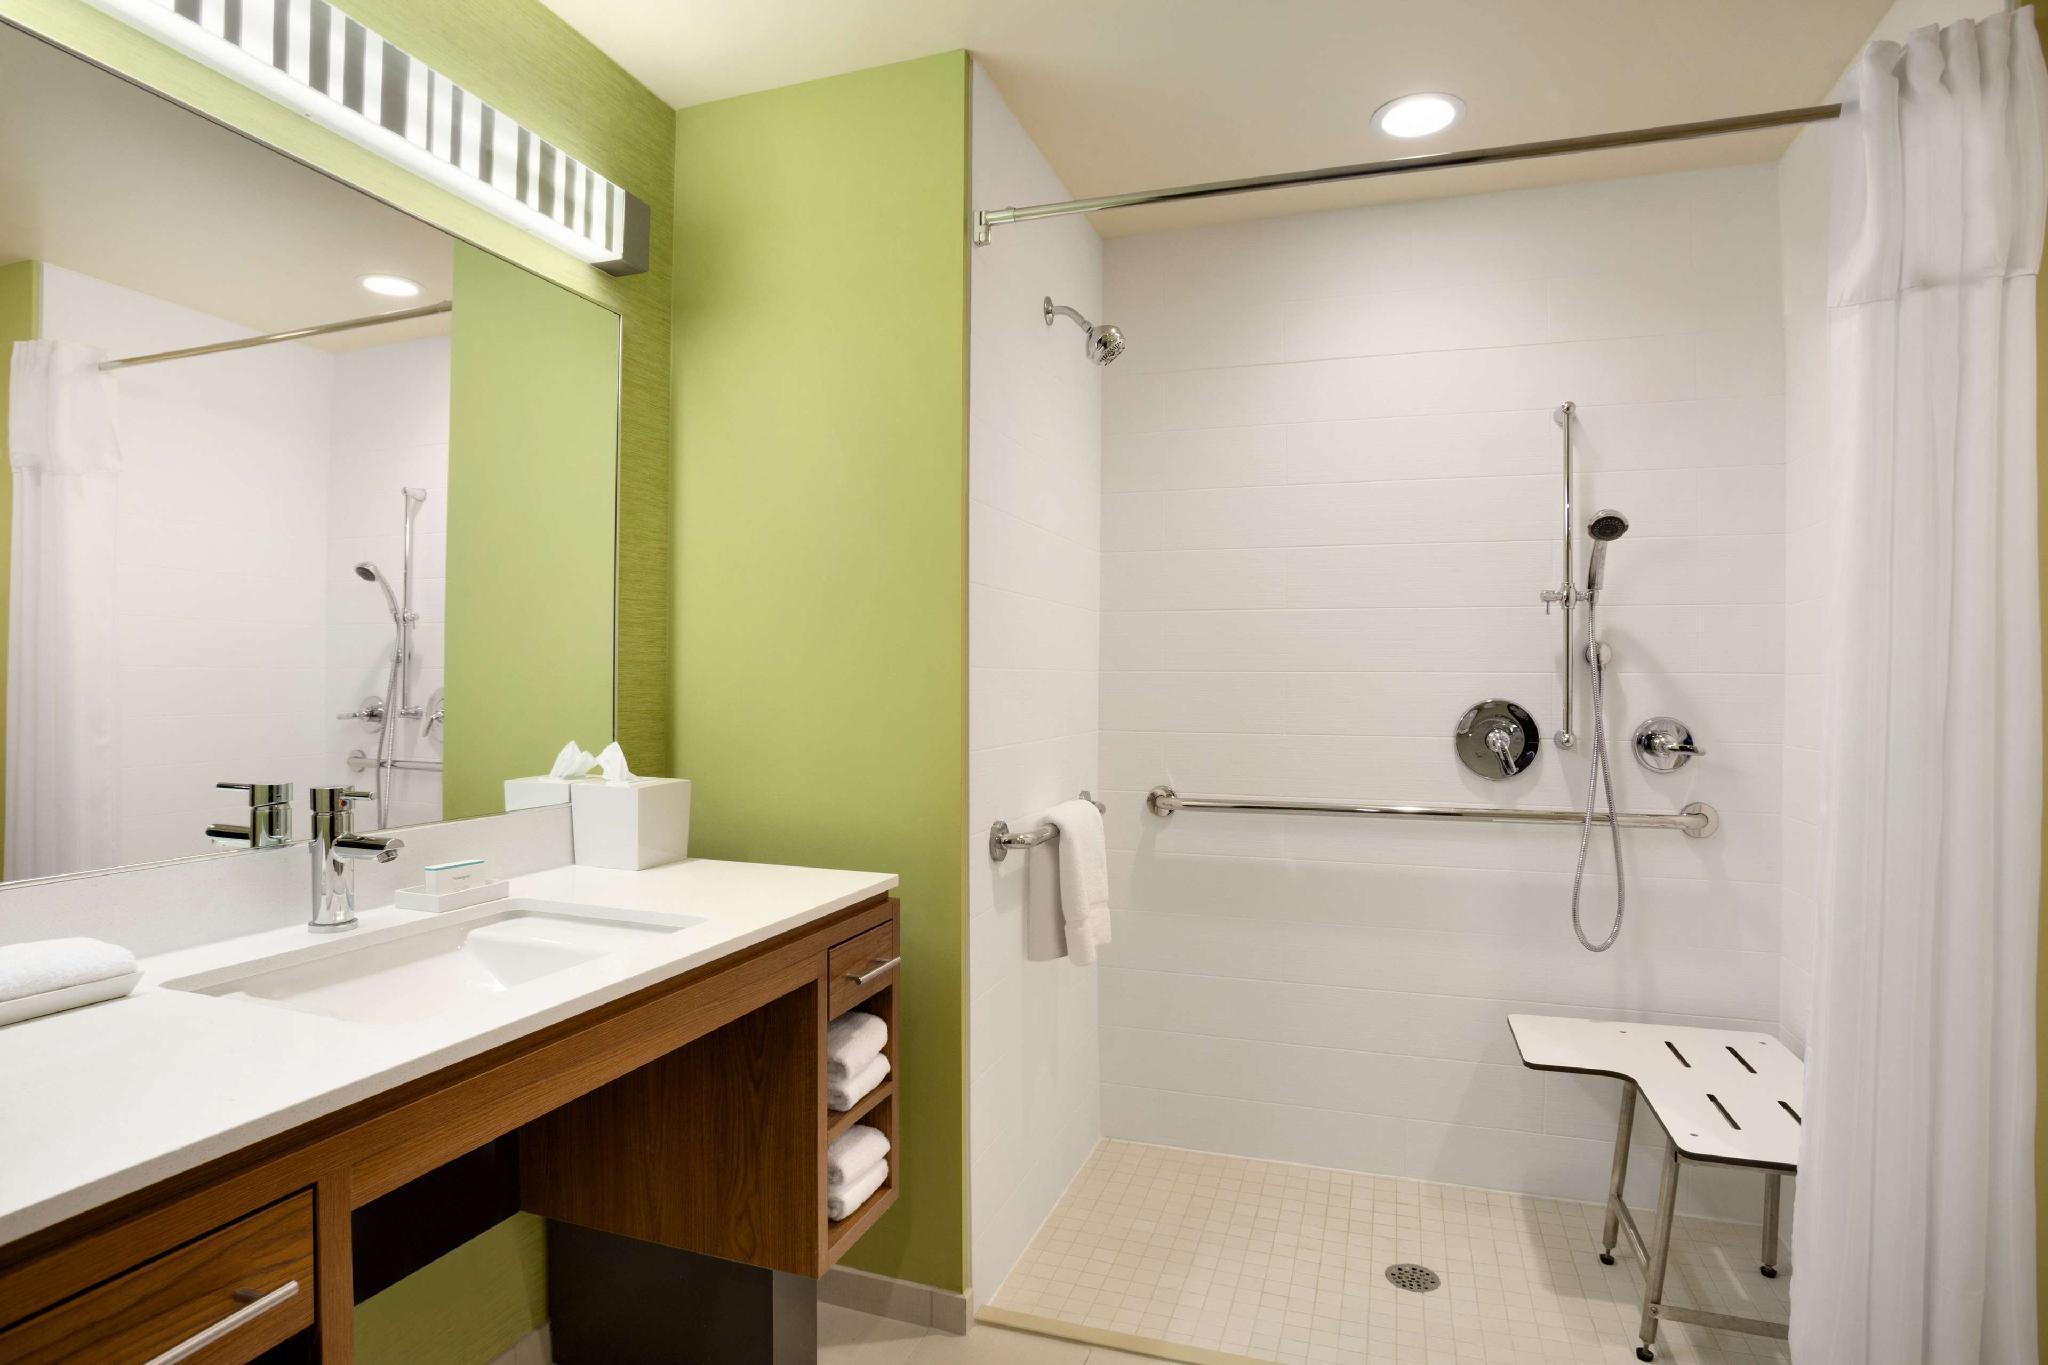 2 Queen Mobility Hearing Roll in Shower Studio